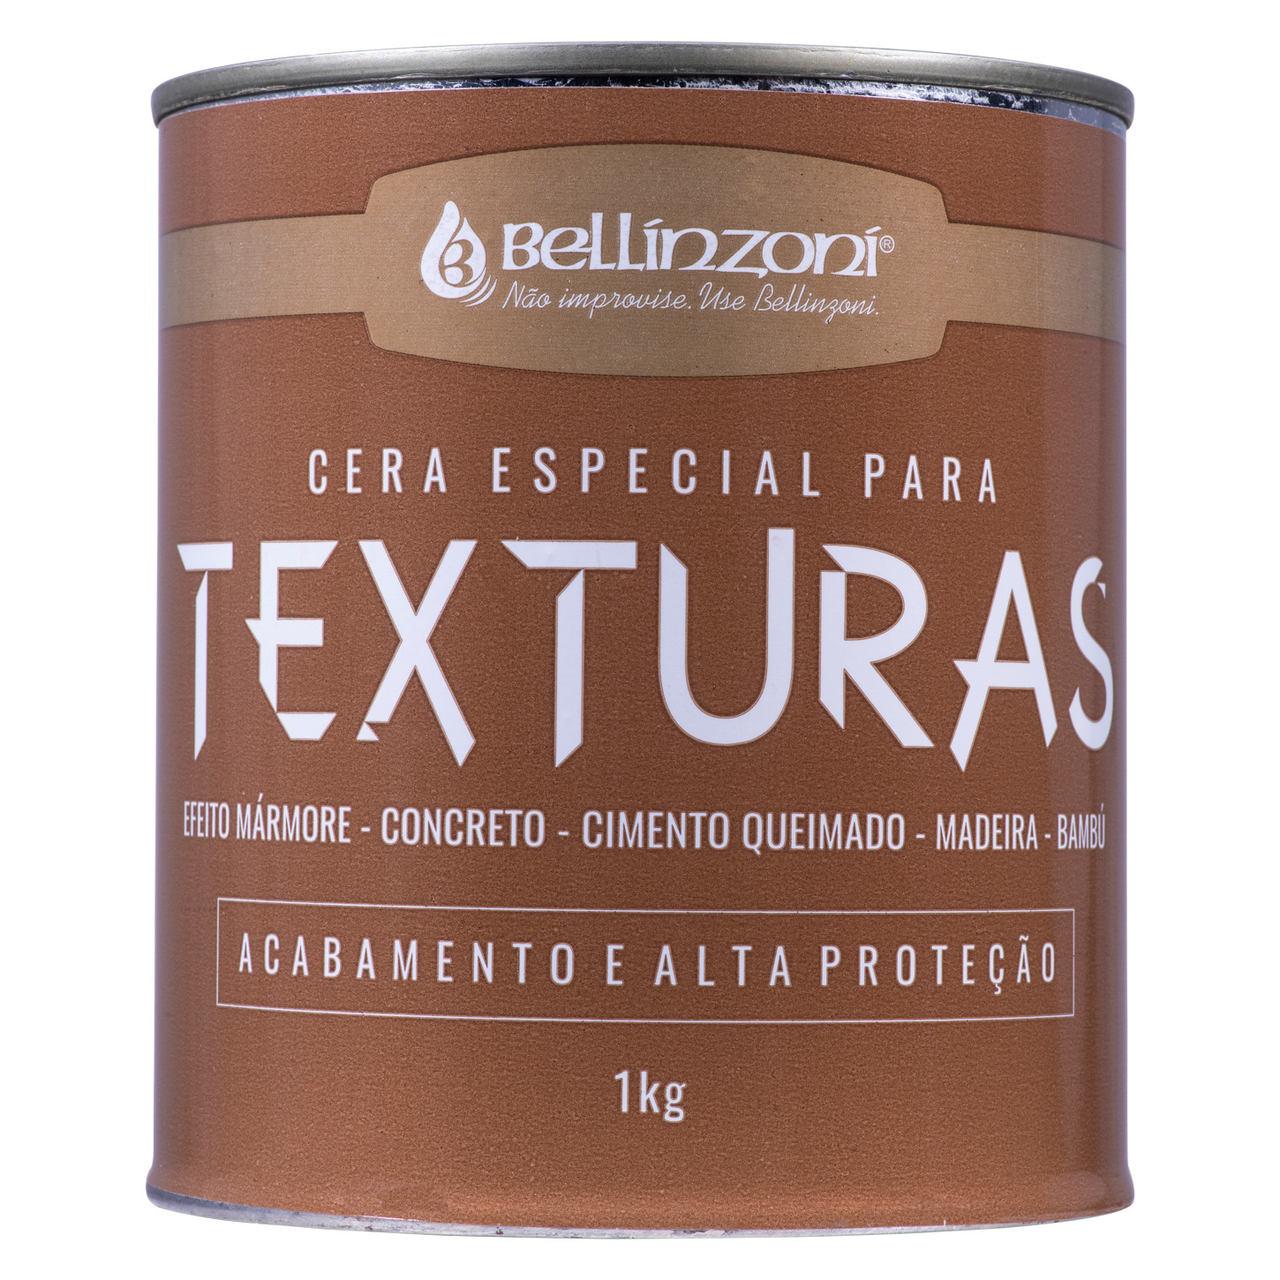 Cera Textura para marmorato Bellinzoni 1kg